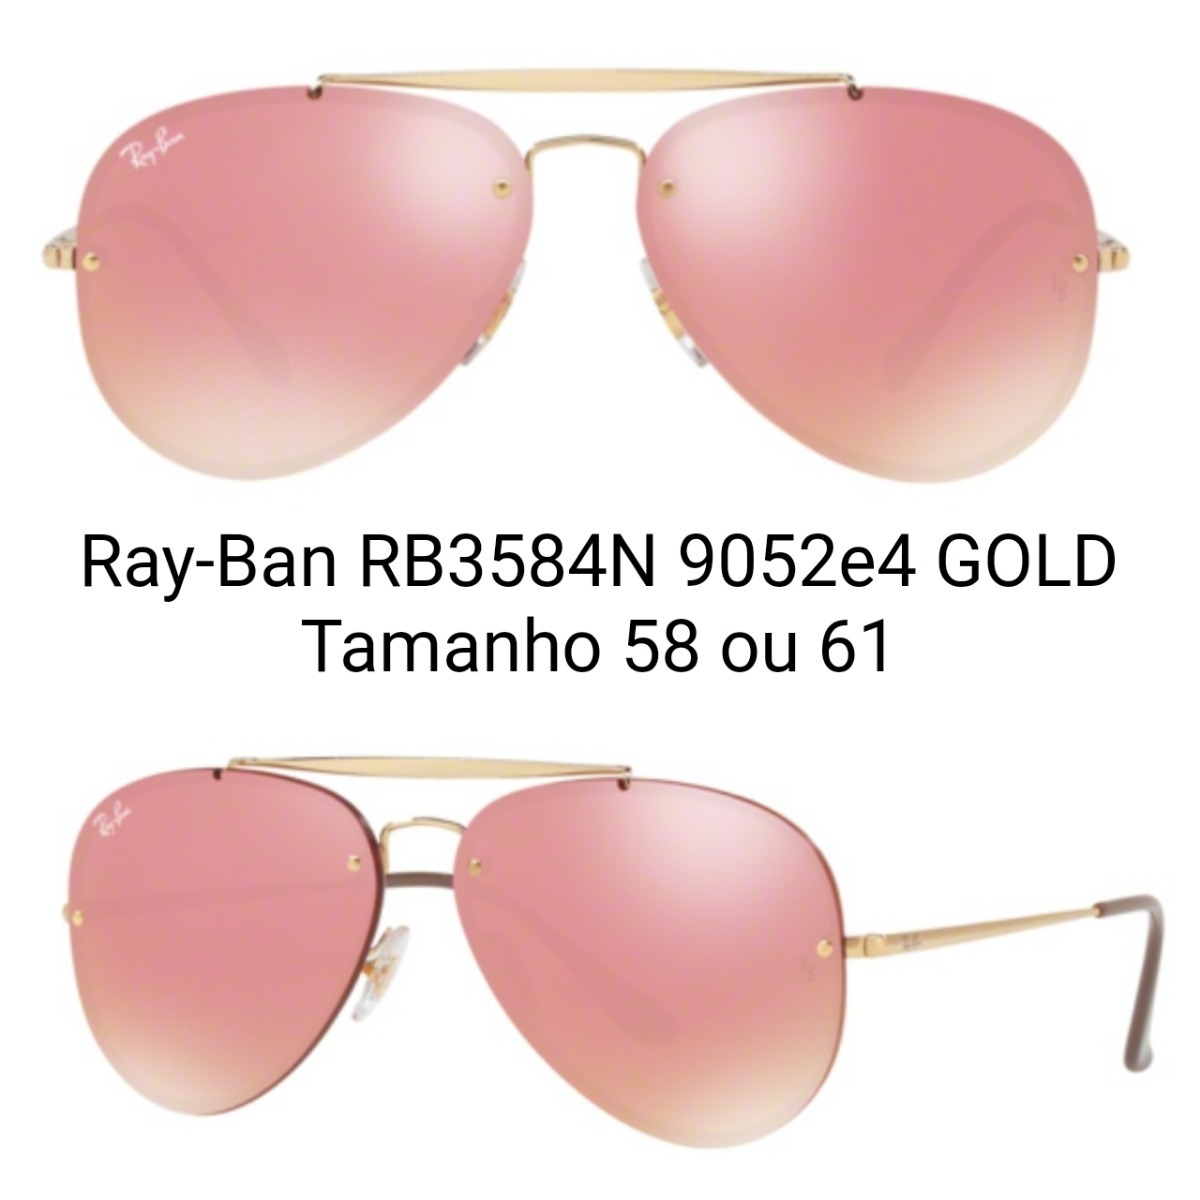 Óculos Ray-ban - Blaze Aviator - Rb3584n - R  449,00 em Mercado Livre 19b0909332